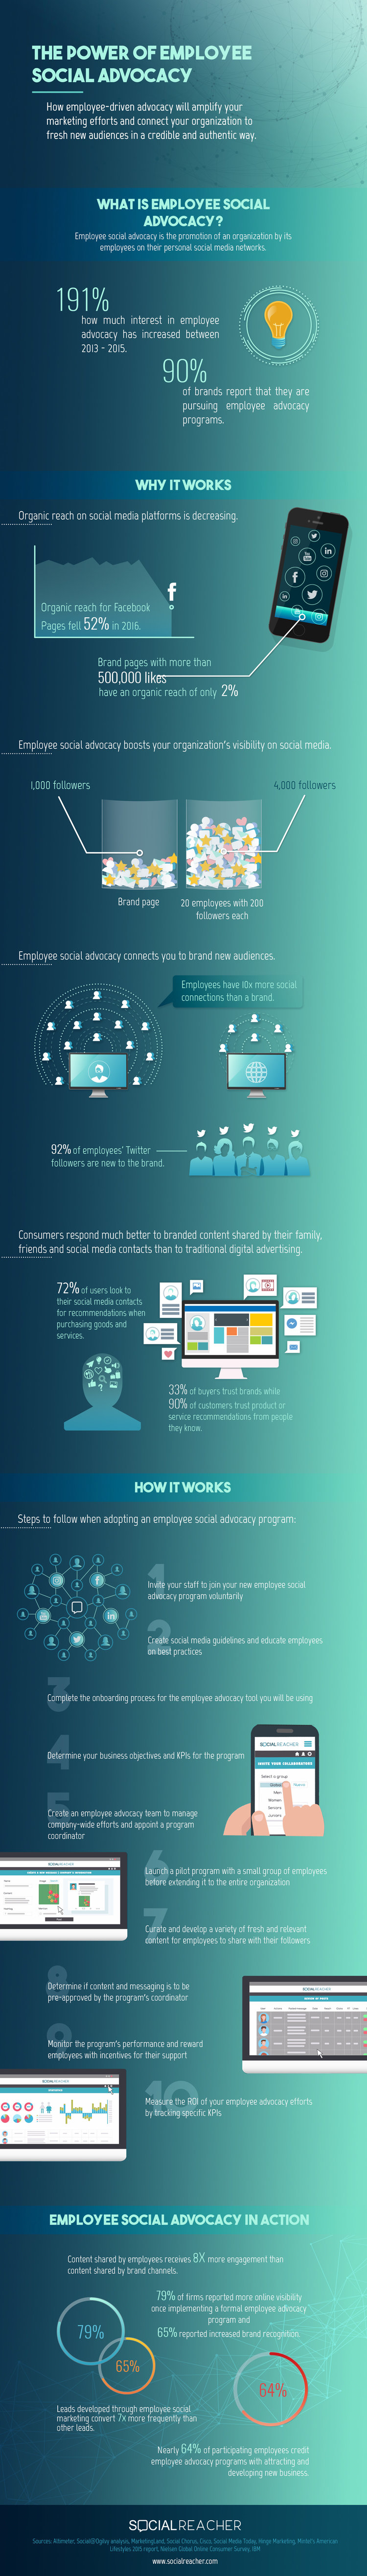 Employee Social Media Advocacy - SocialReacher - infographic